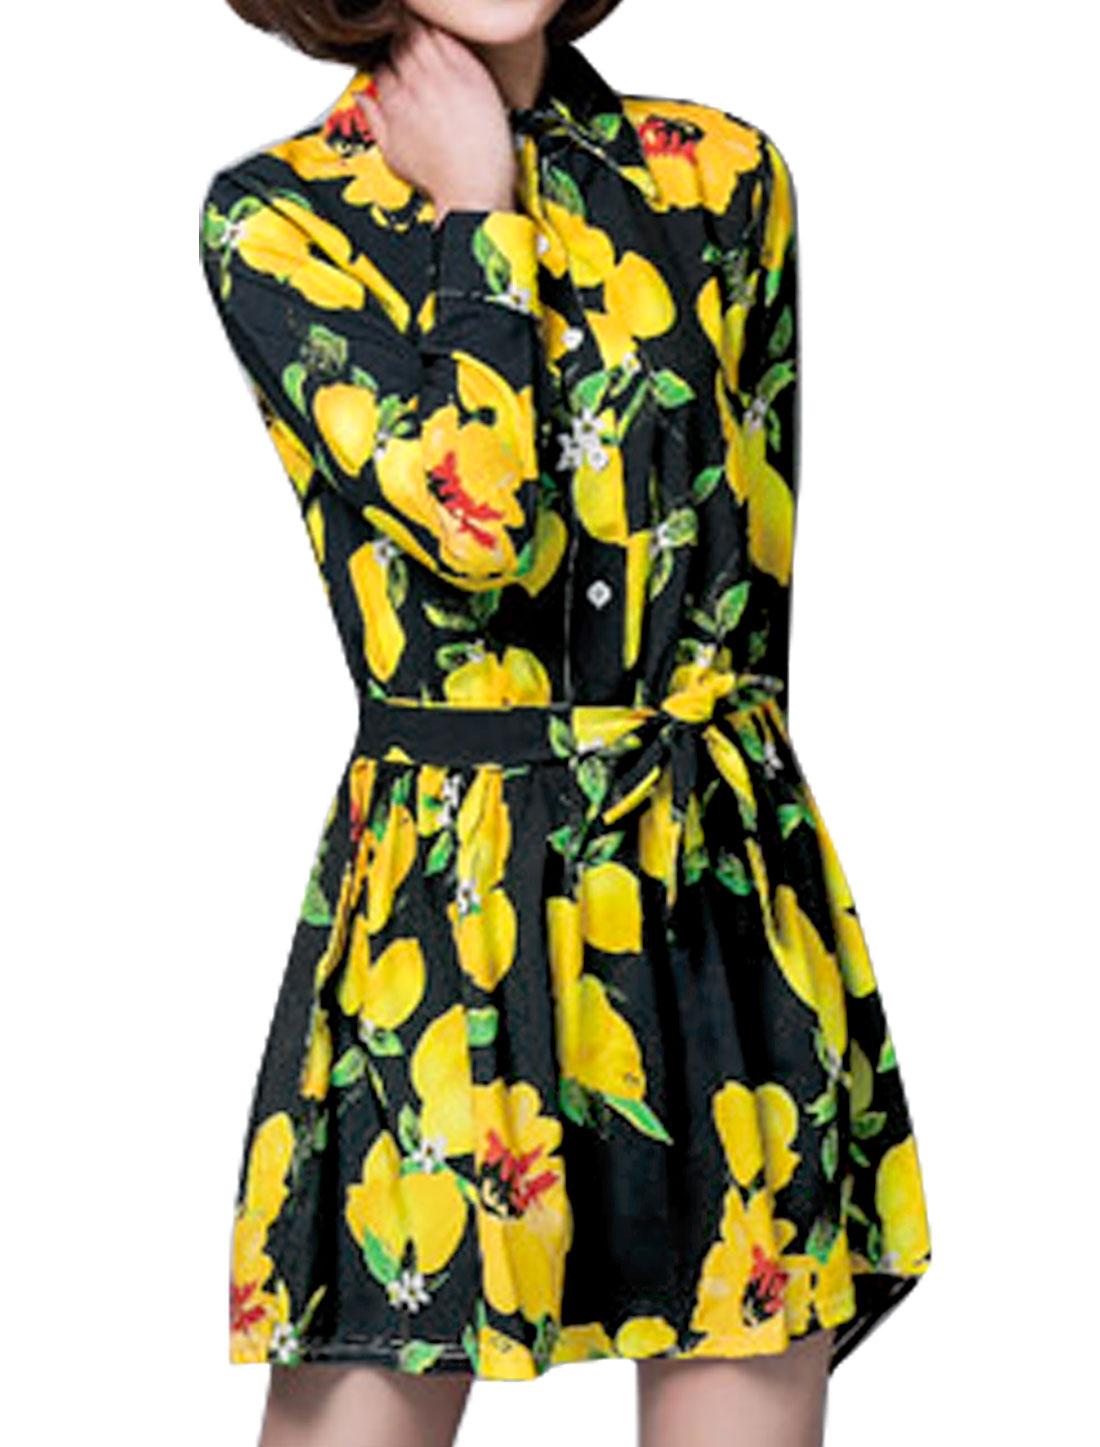 Women Lemon Prints Long Sleeves Belted Shirt Dress Black M